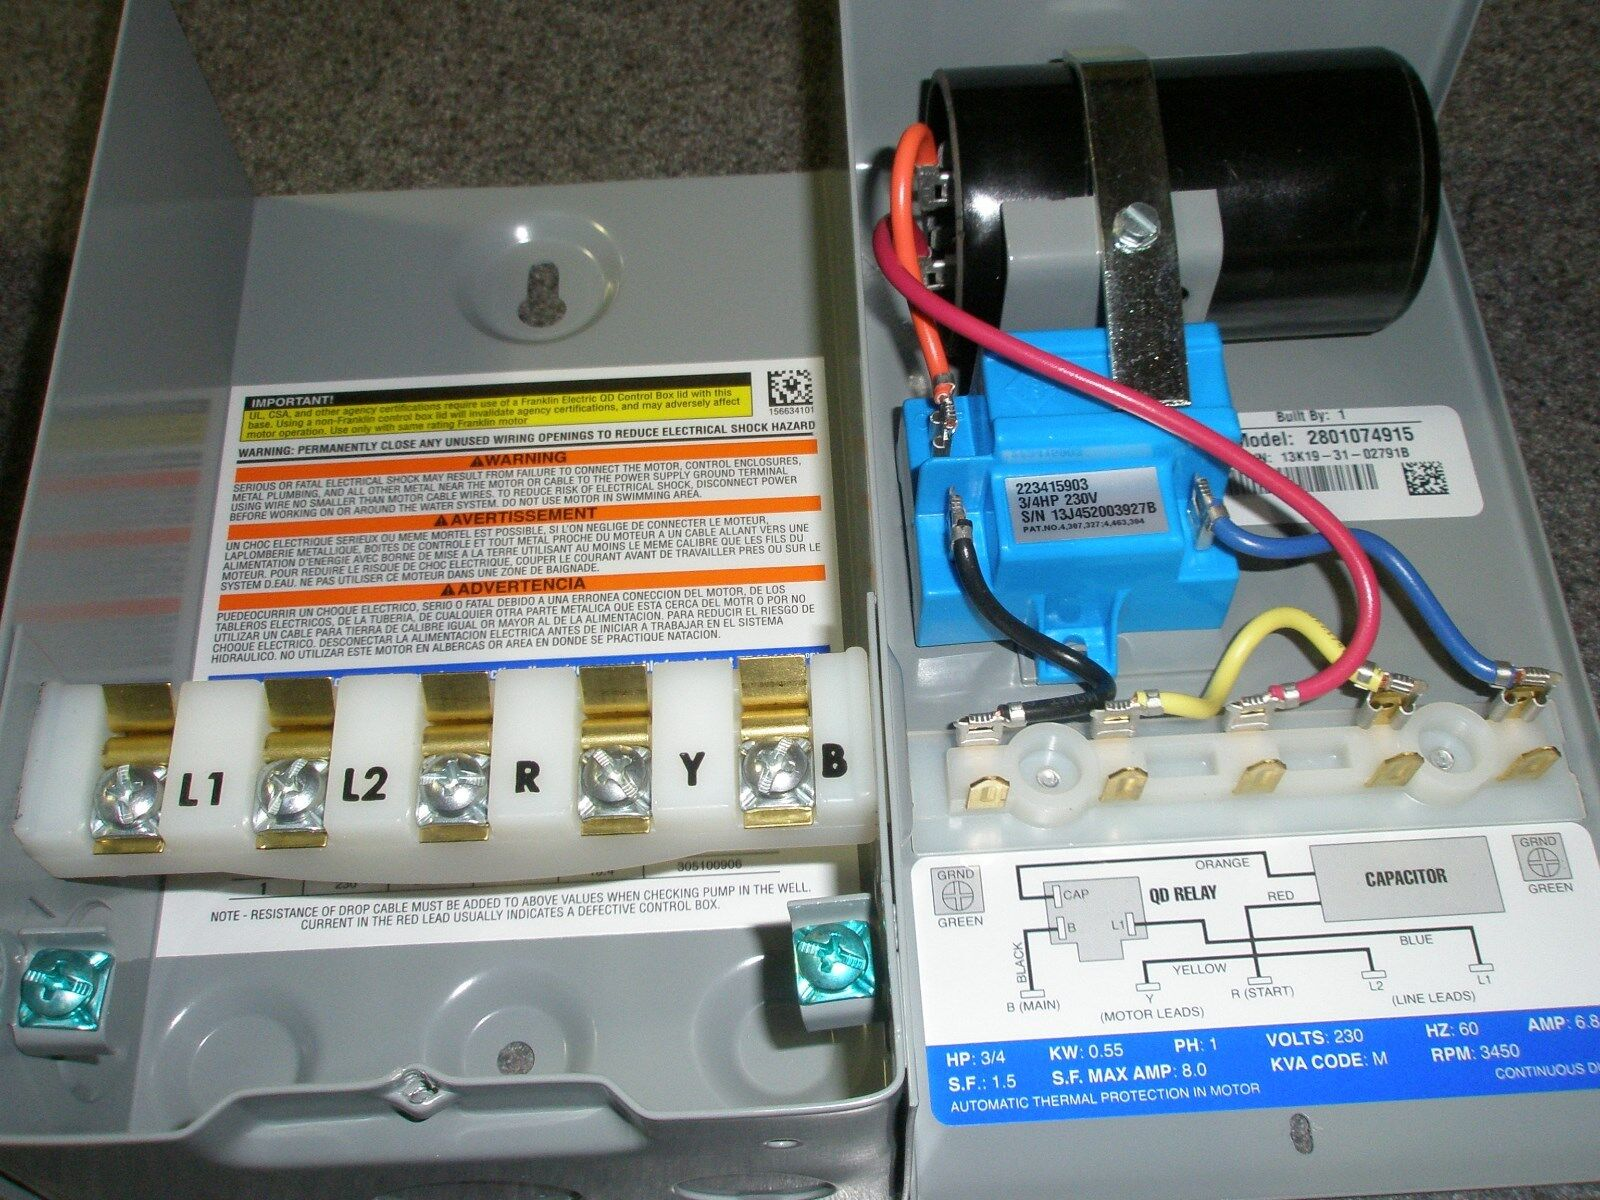 34 Hp 230v Franklin Qd Control Box Submersible Water Pump 2801074915 Wiring 3 4 New